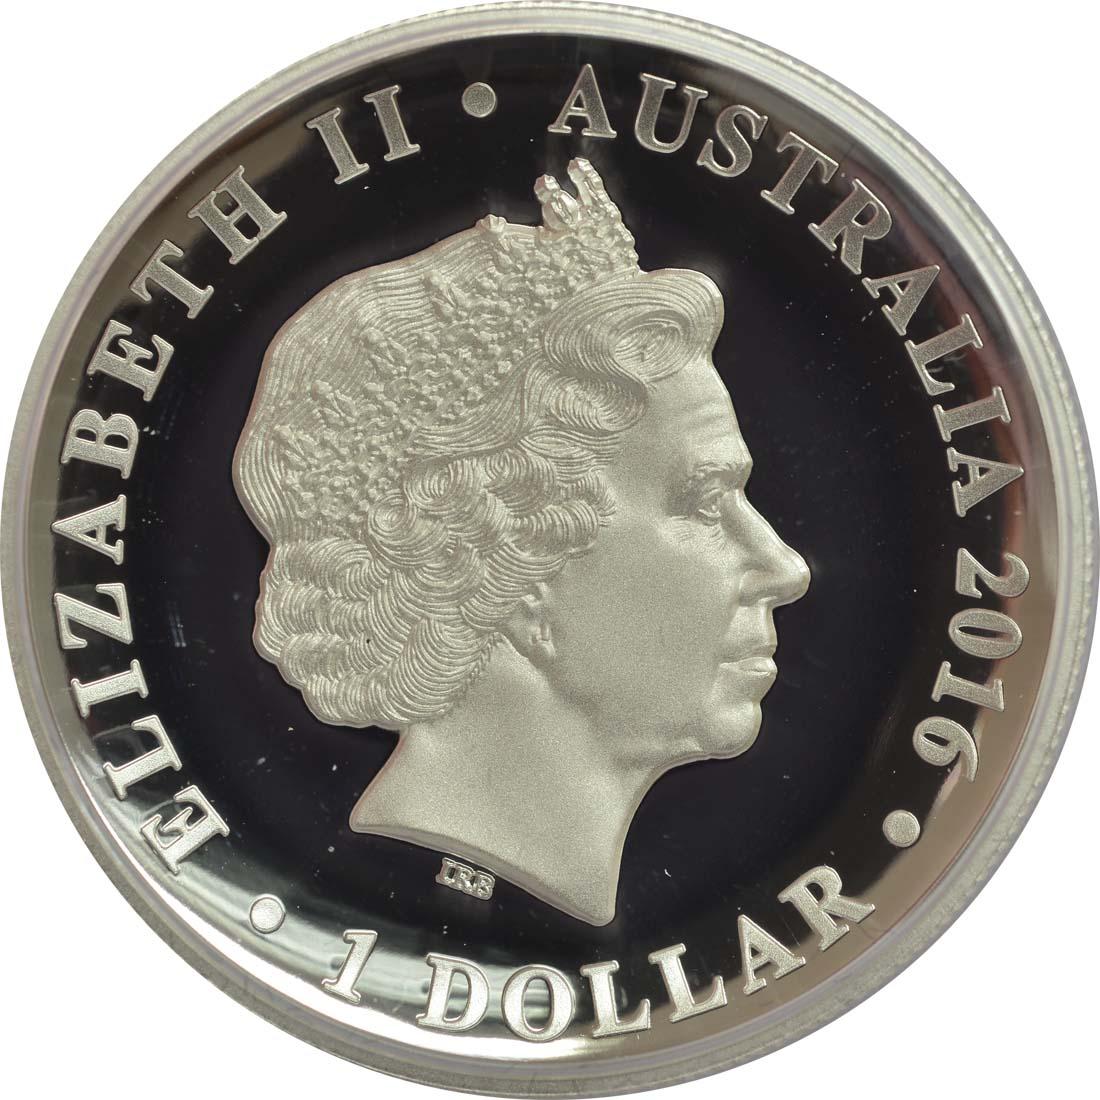 Australien 1 Dollar 90 Geburtstag Elizabeth Ii Highrelief 2016